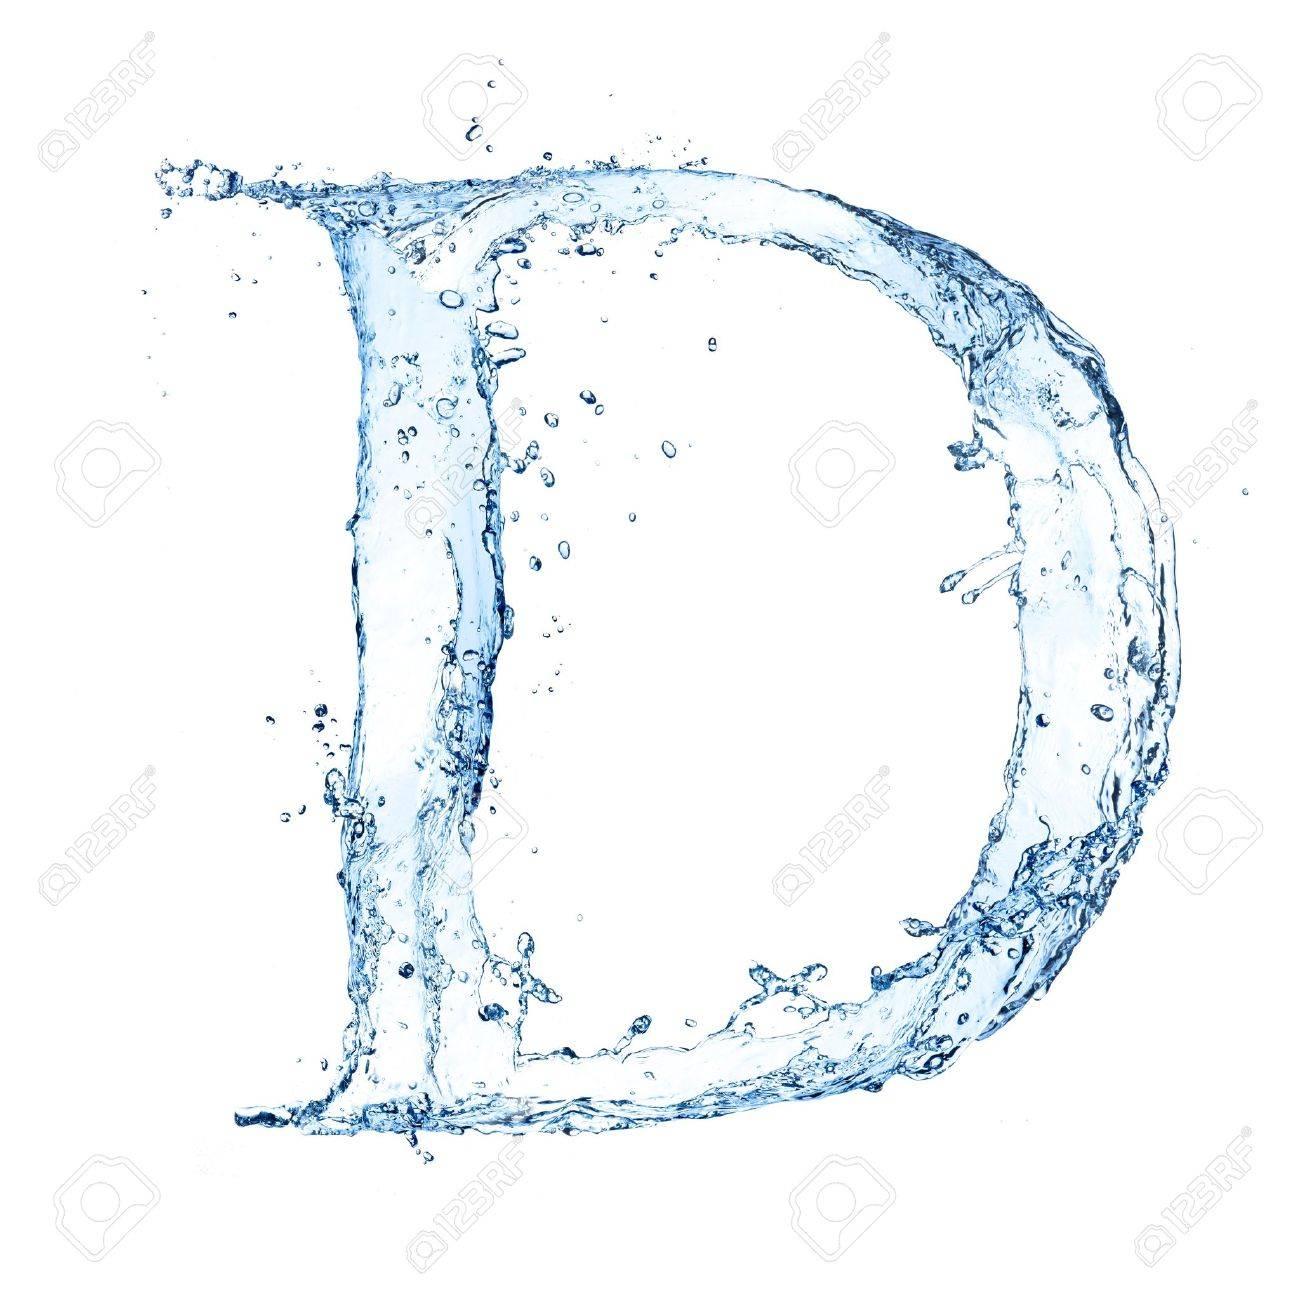 Water splashes letter Stock Photo - 14815635